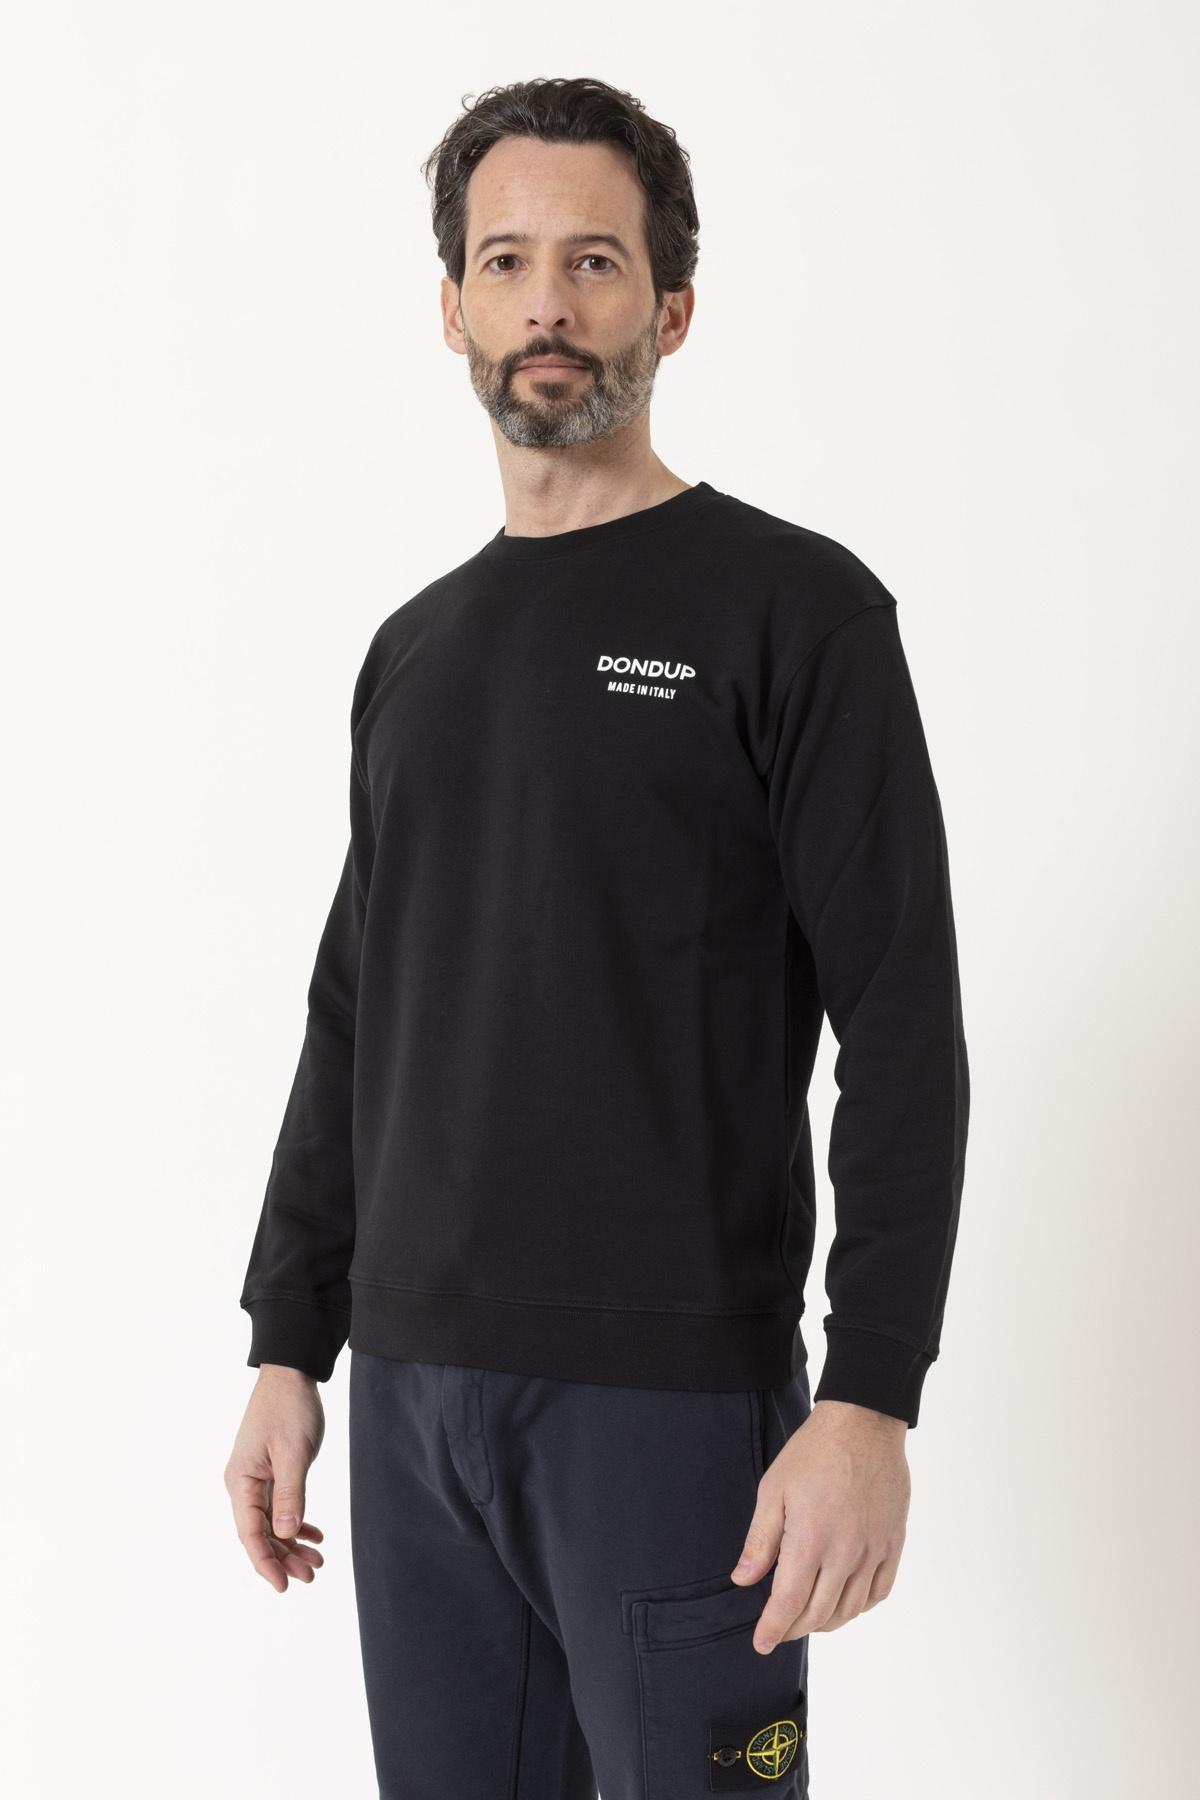 Sweatshirt for man DONDUP S/S 21